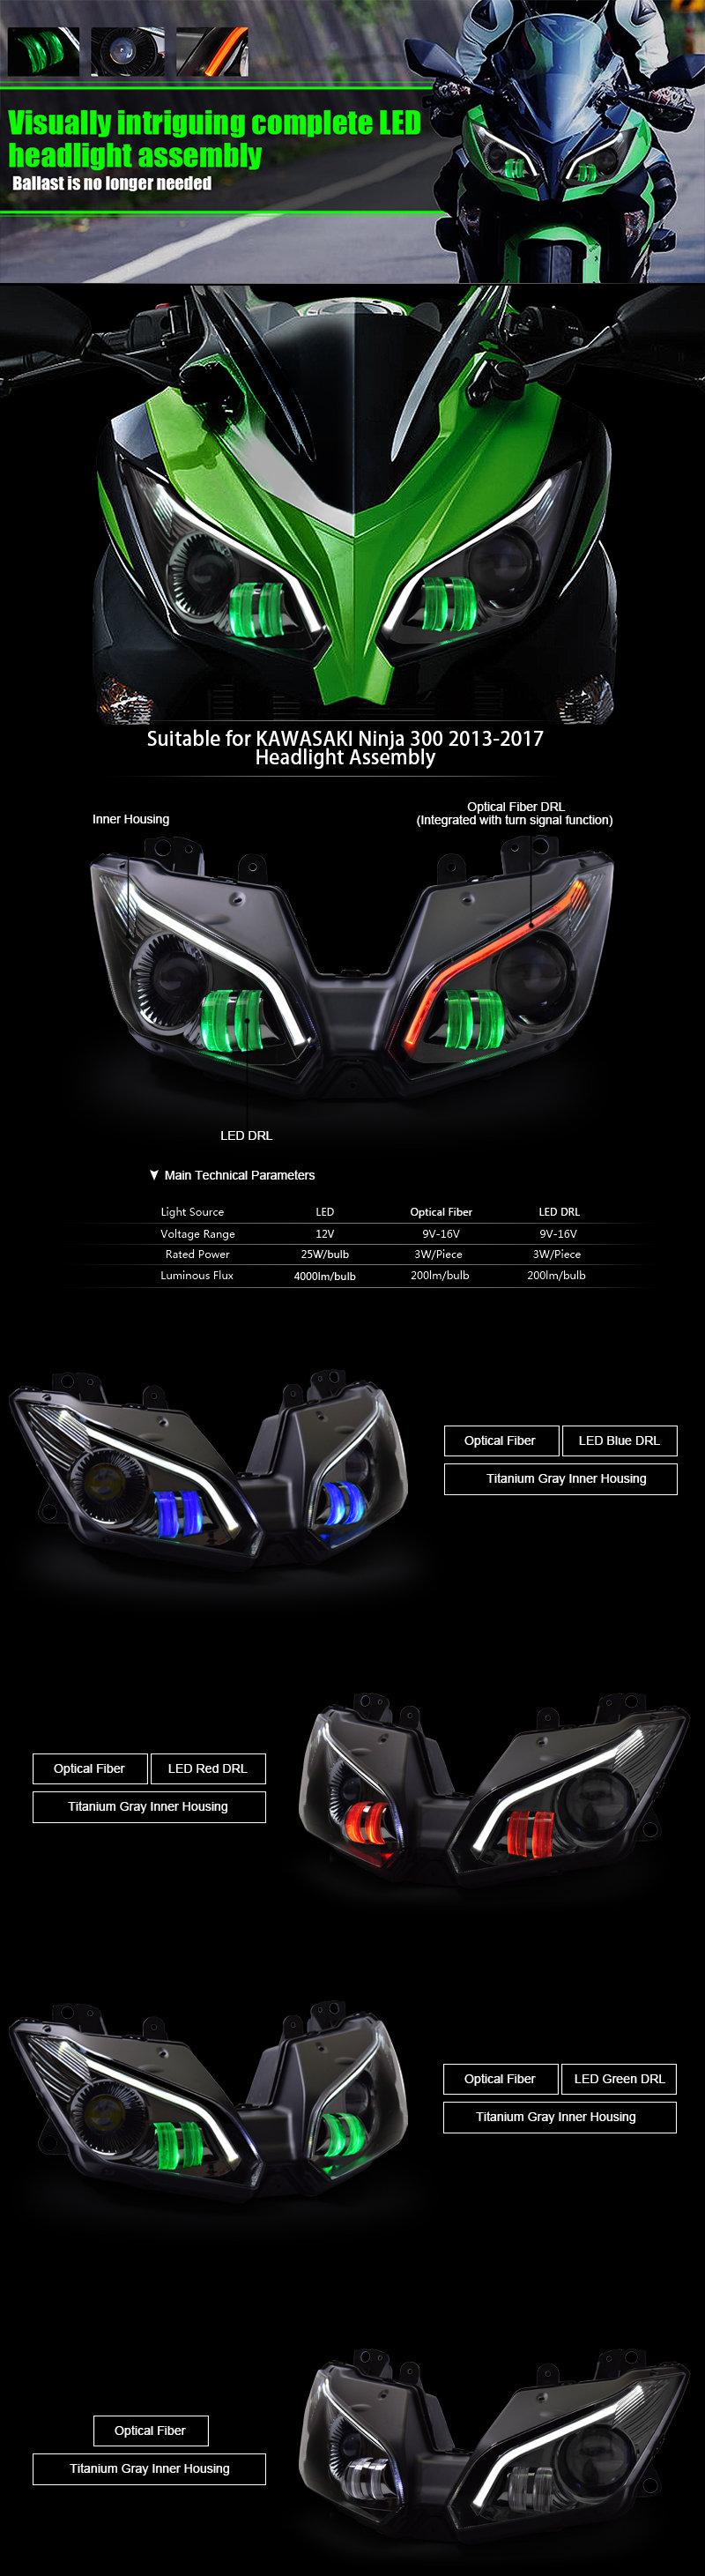 Kawasaki Ninja300 Headlight 2015 206 2017